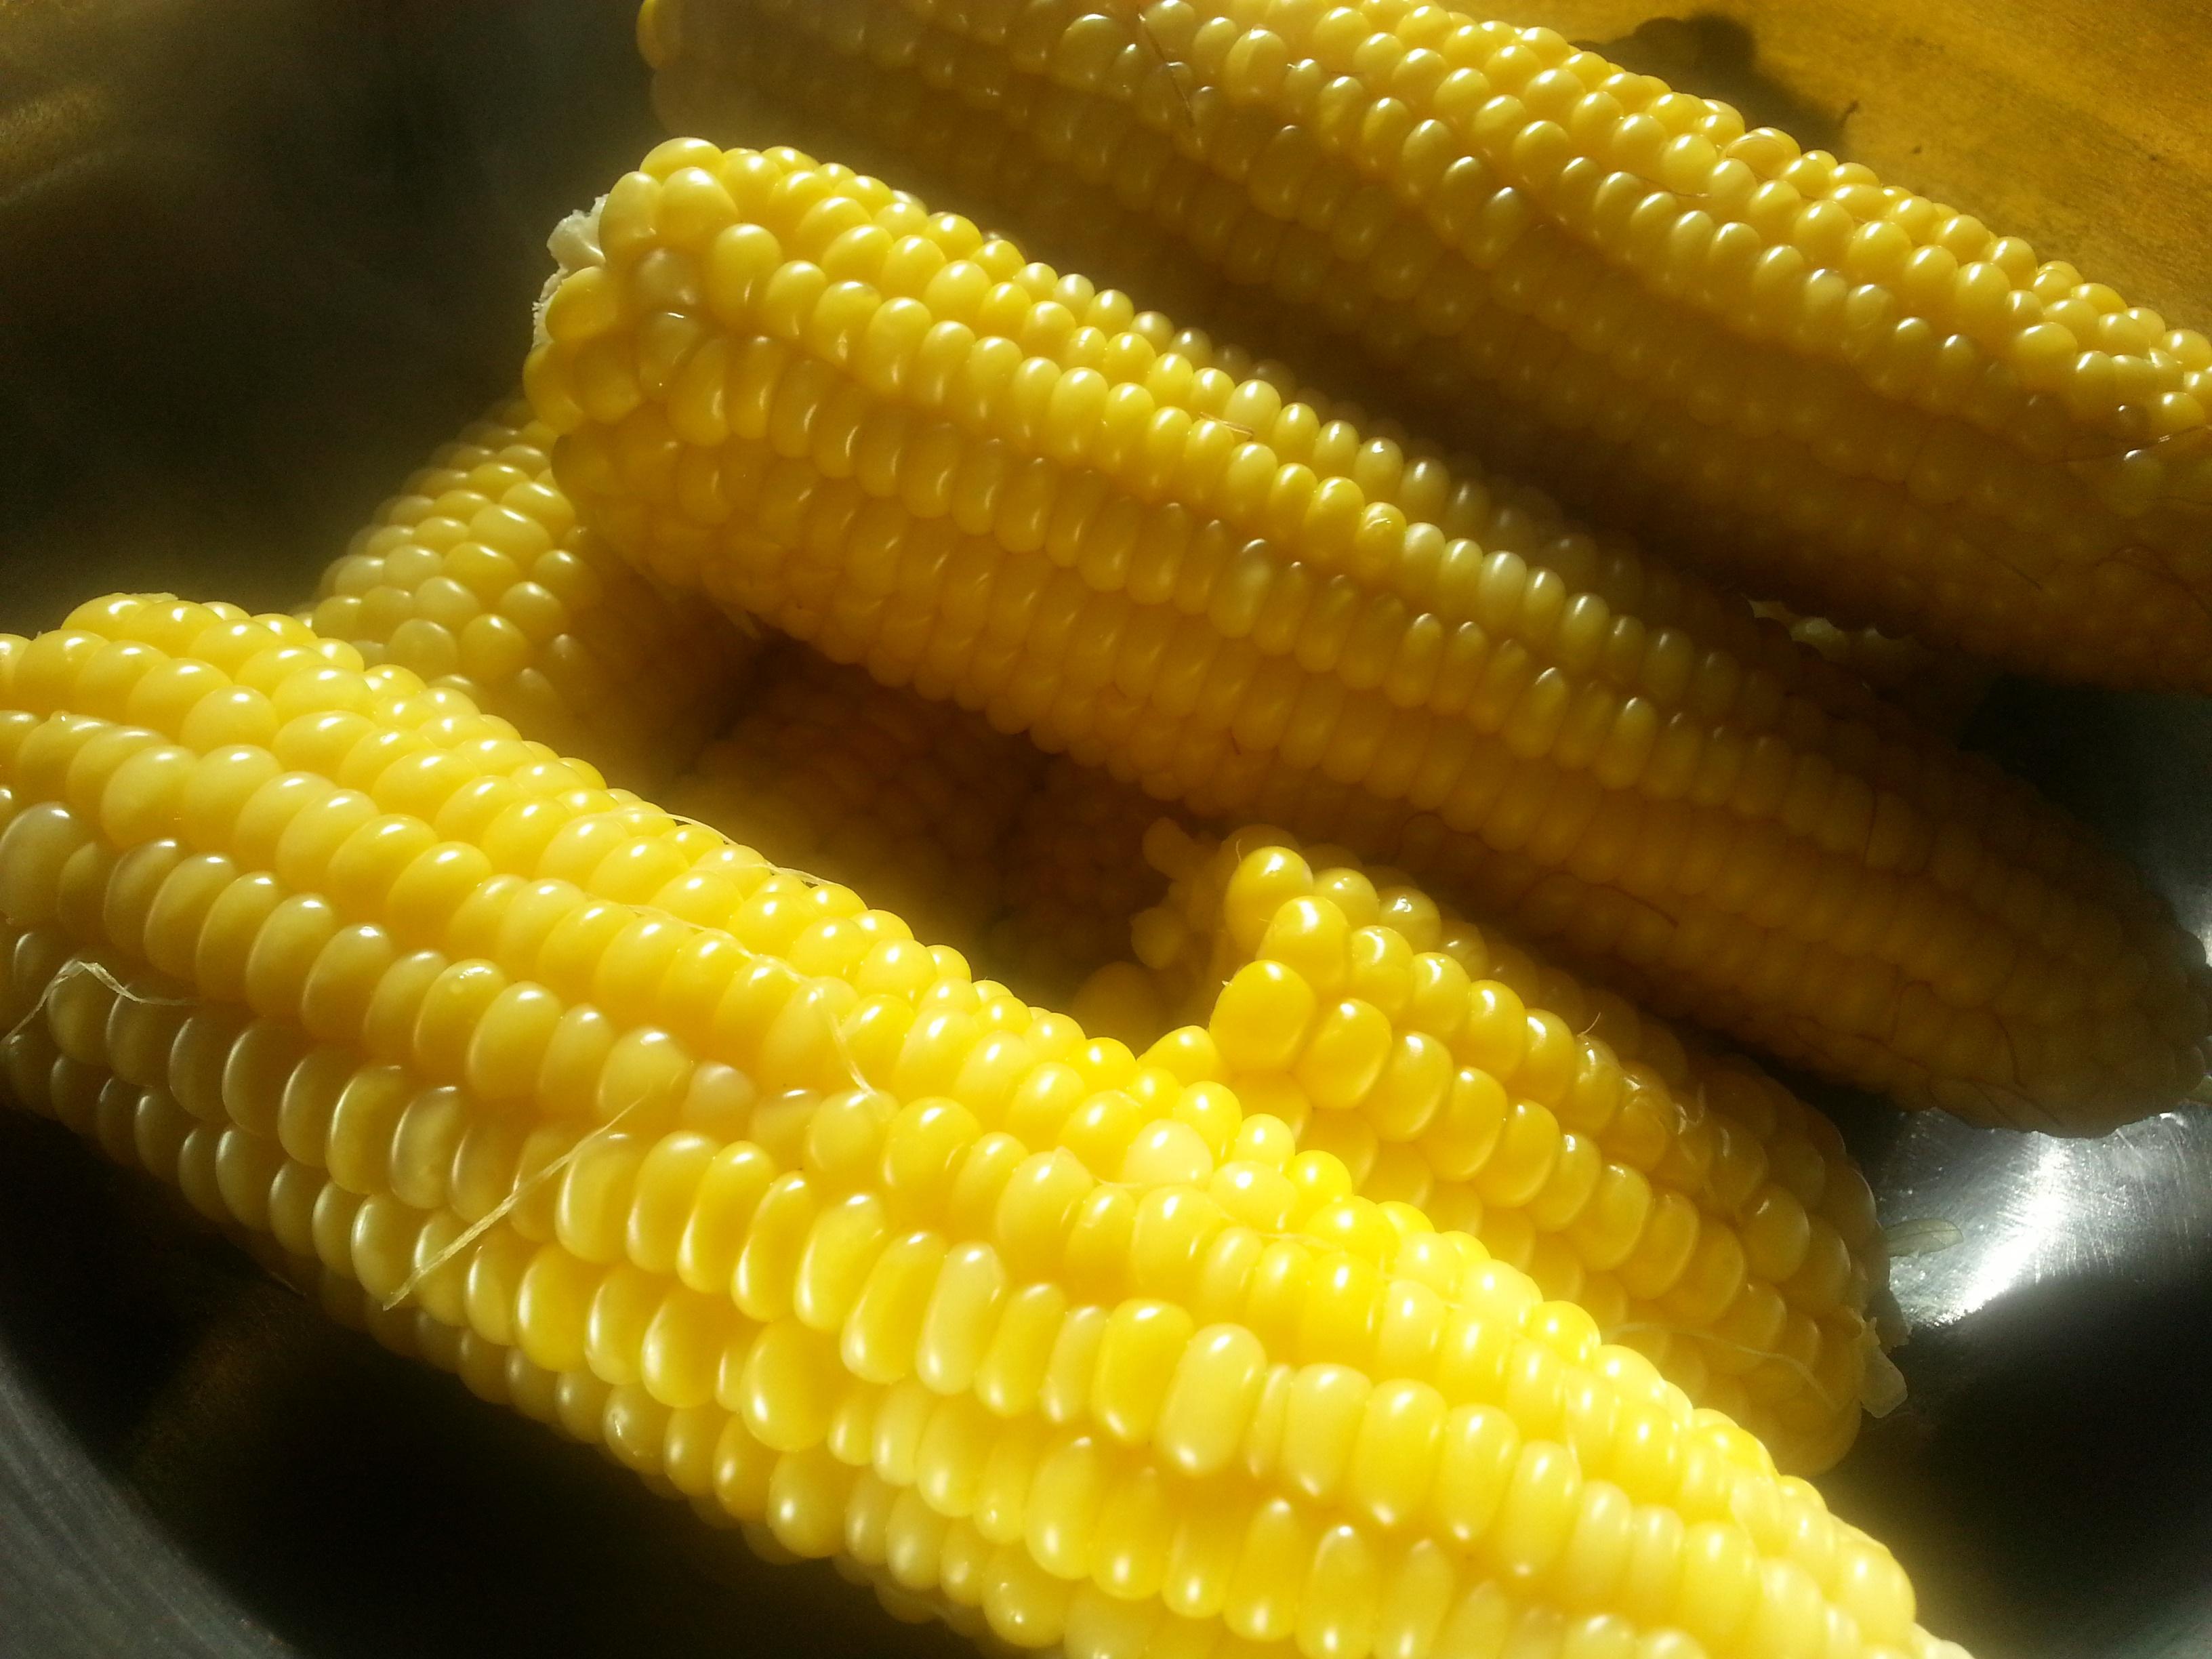 Free Images : produce, vegetable, crop, cuisine, sweetcorn